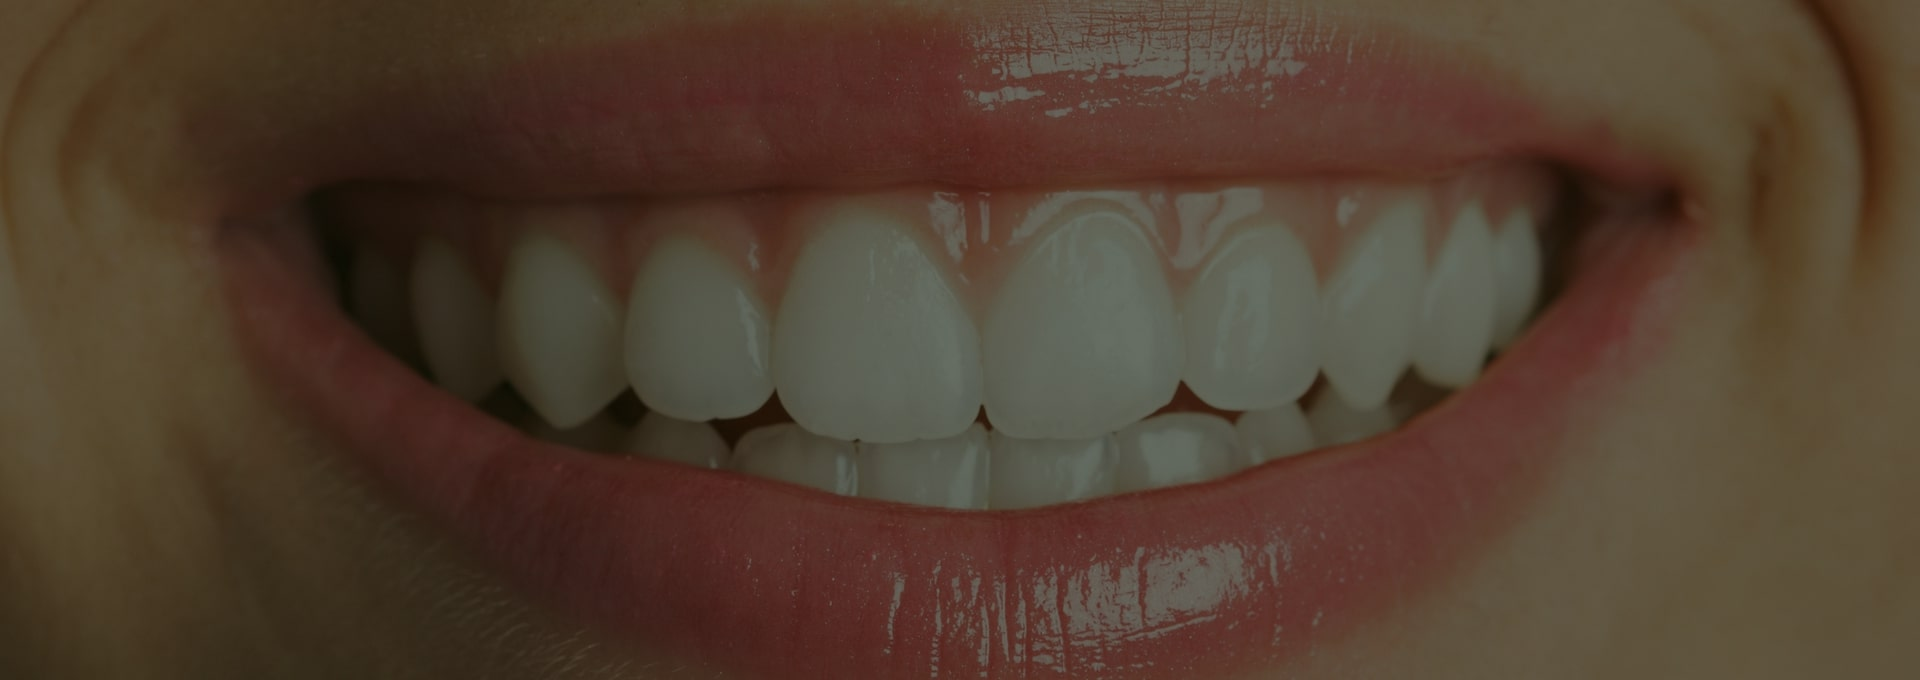 Clínica Odontologia Estética em Brasília - StudioUno Odontologia